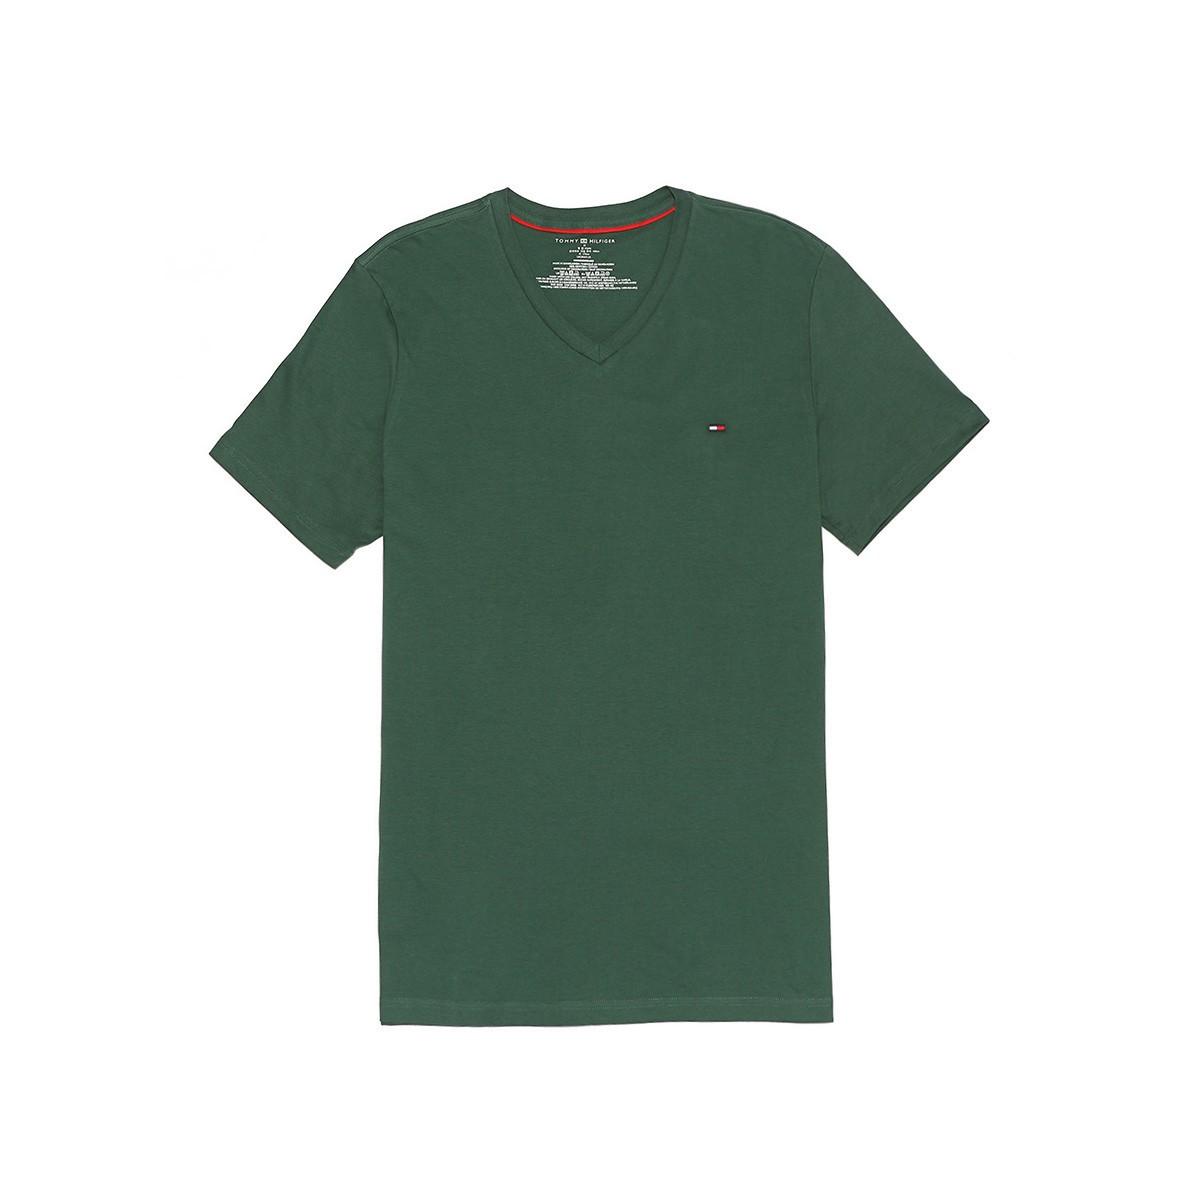 TOMMY HILFIGER 汤米·希尔费格 09T3140 男士T恤